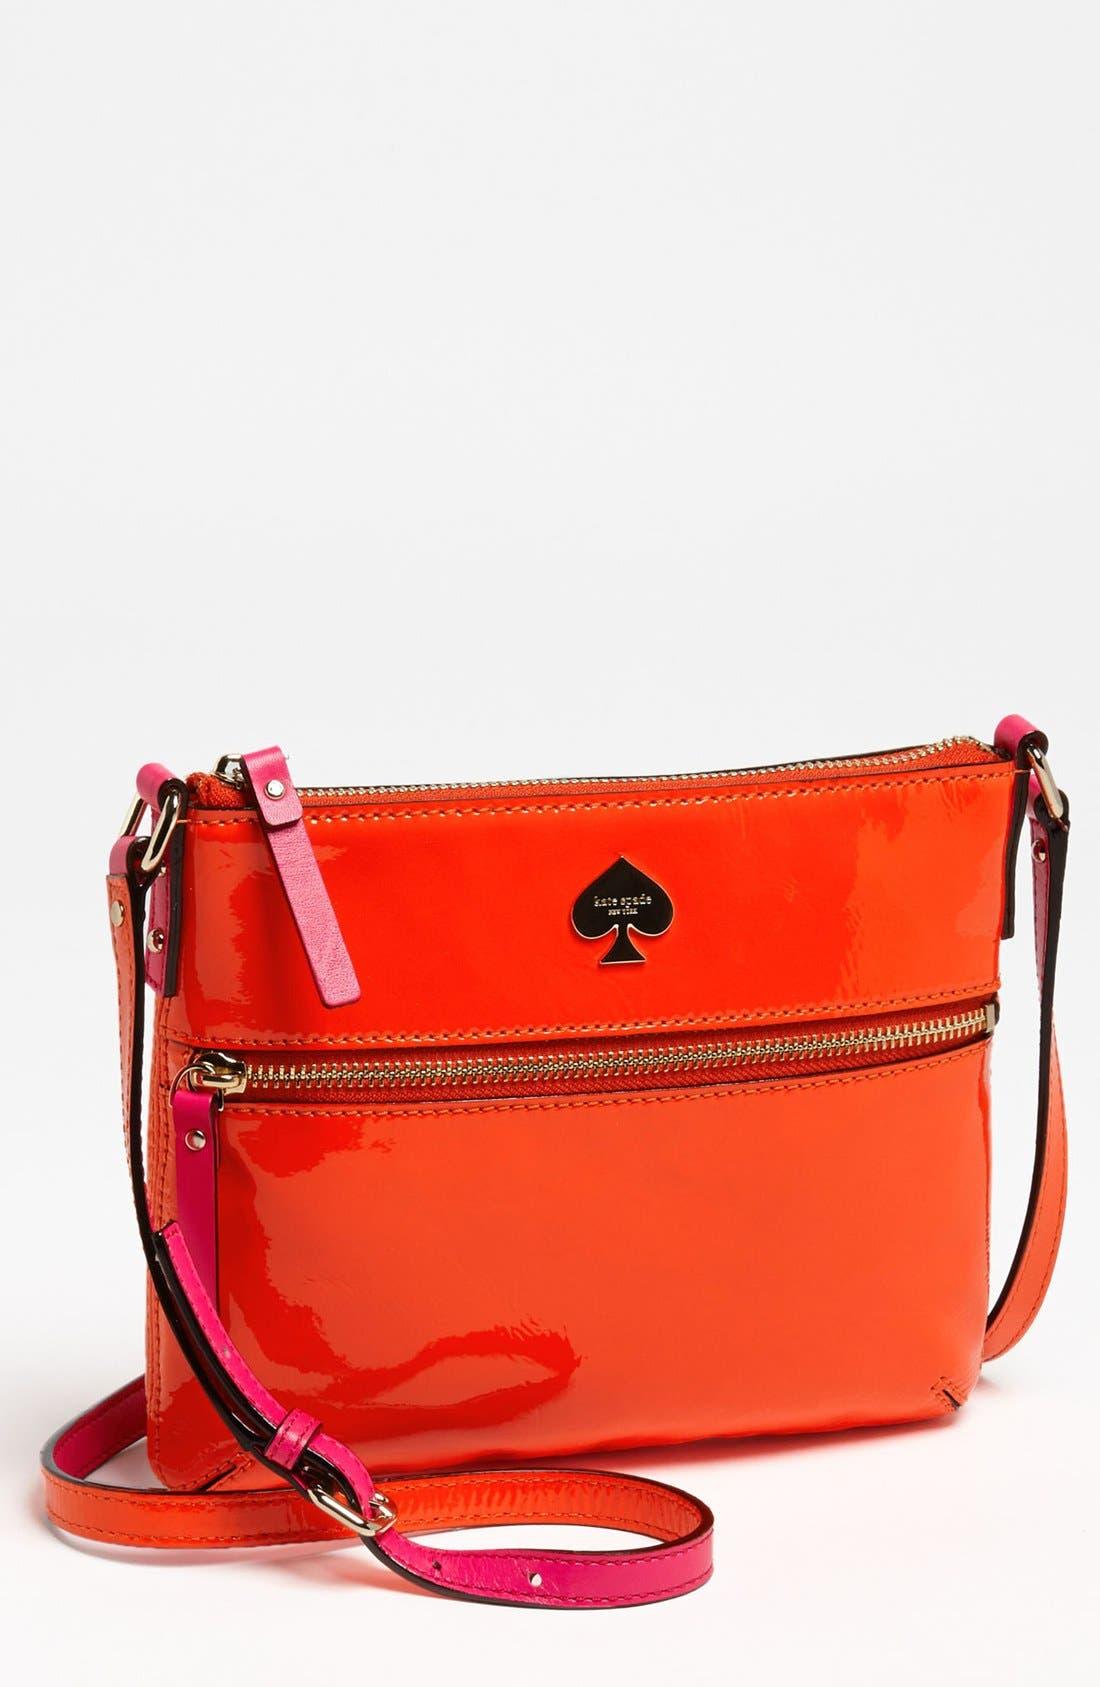 Alternate Image 1 Selected - kate spade new york 'flicker - tenley' patent crossbody bag